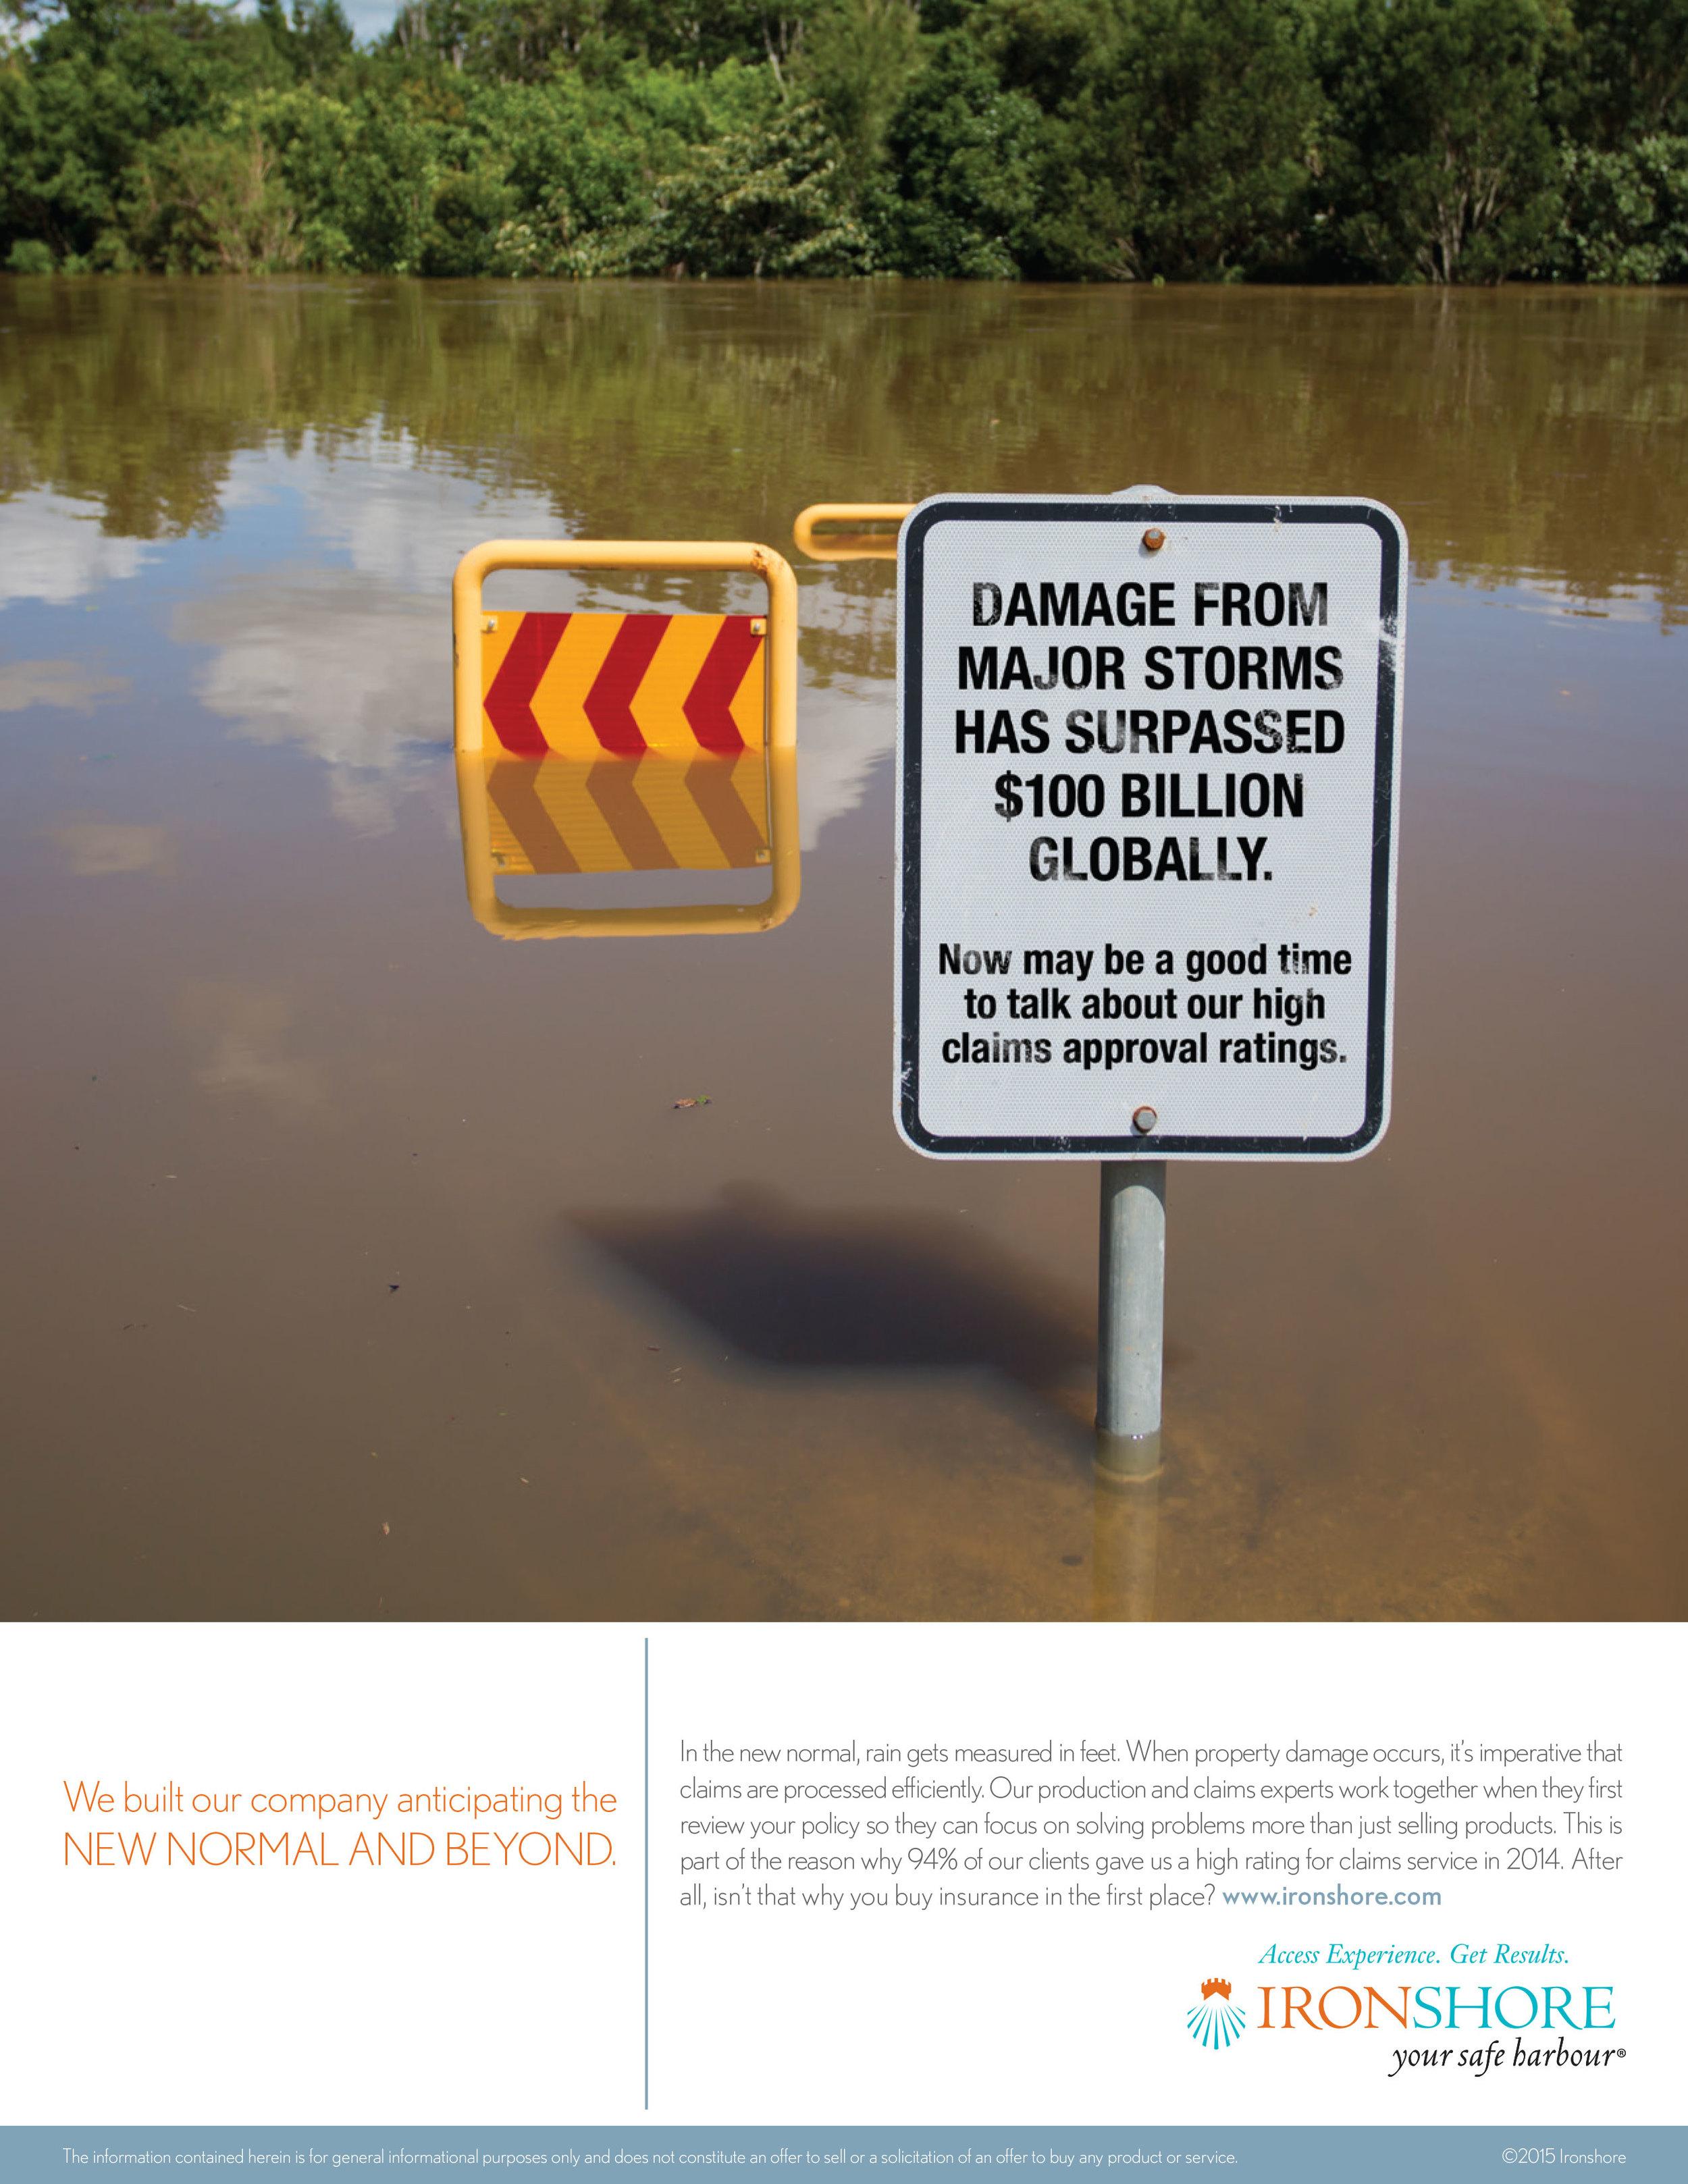 ironshore-insurance-advertising-storm-coverage.jpg